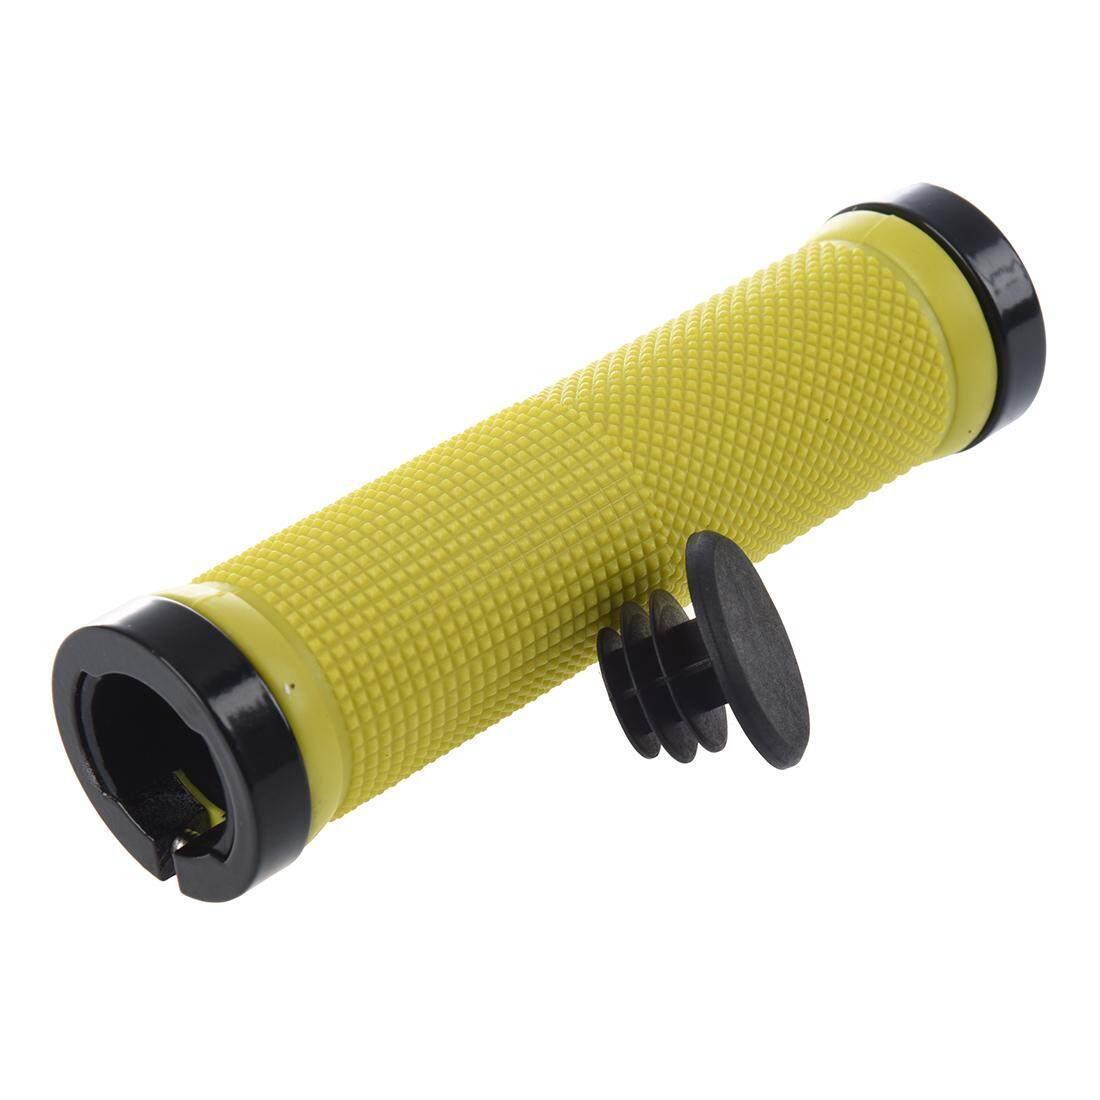 Double Jalan Gunung MTB BMX Bersepeda Kunci Sepeda Di Grip Pengunci Pegangan Stang (Kuning) (Intl)-Intl